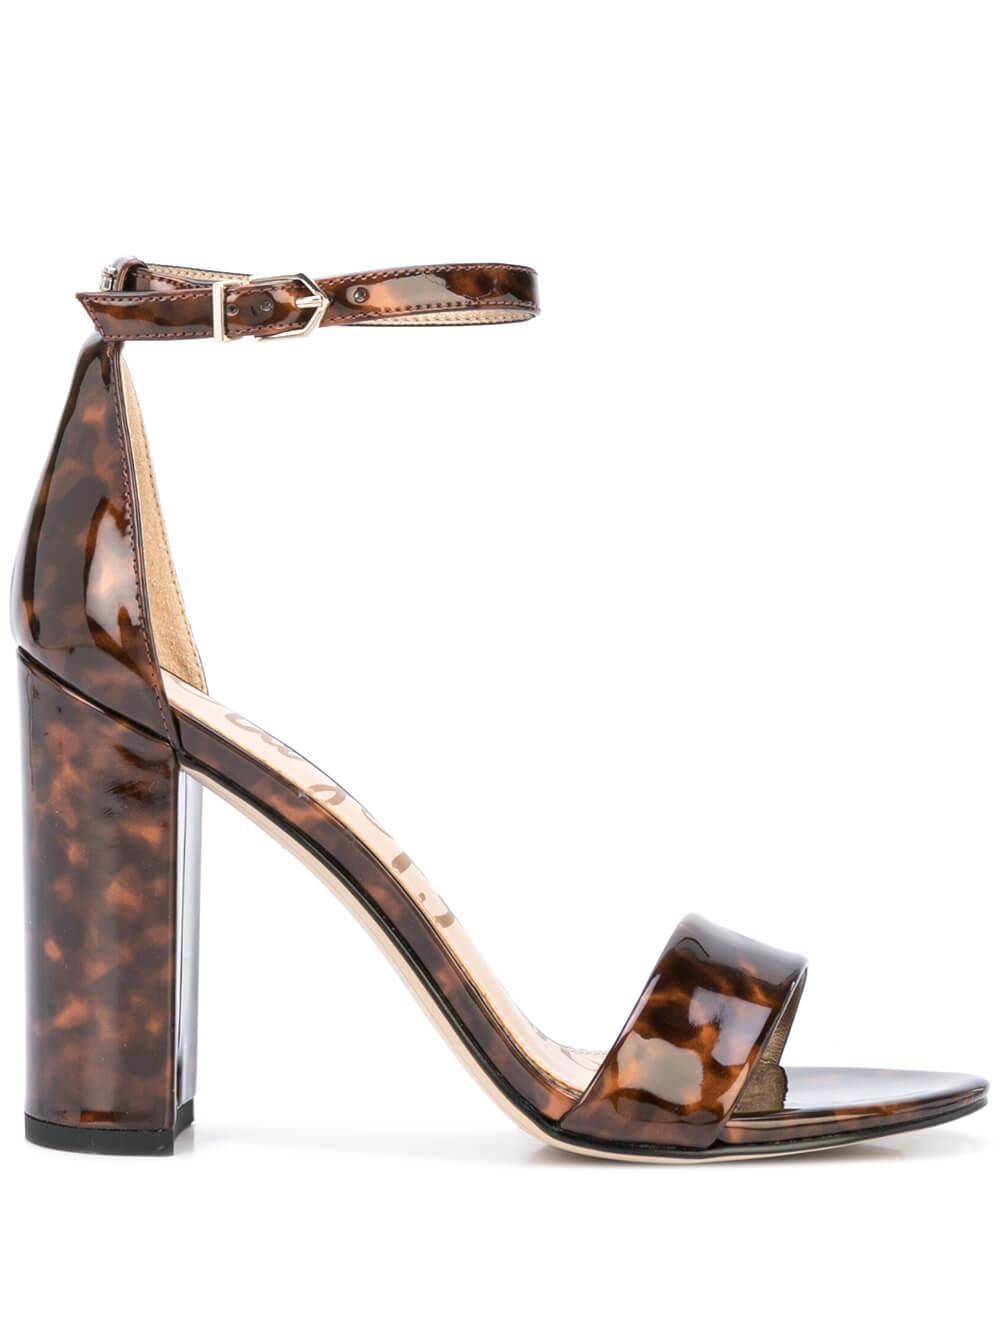 Yaro Patent Tortoise Block Heel Sandal Item # YARO-TORT